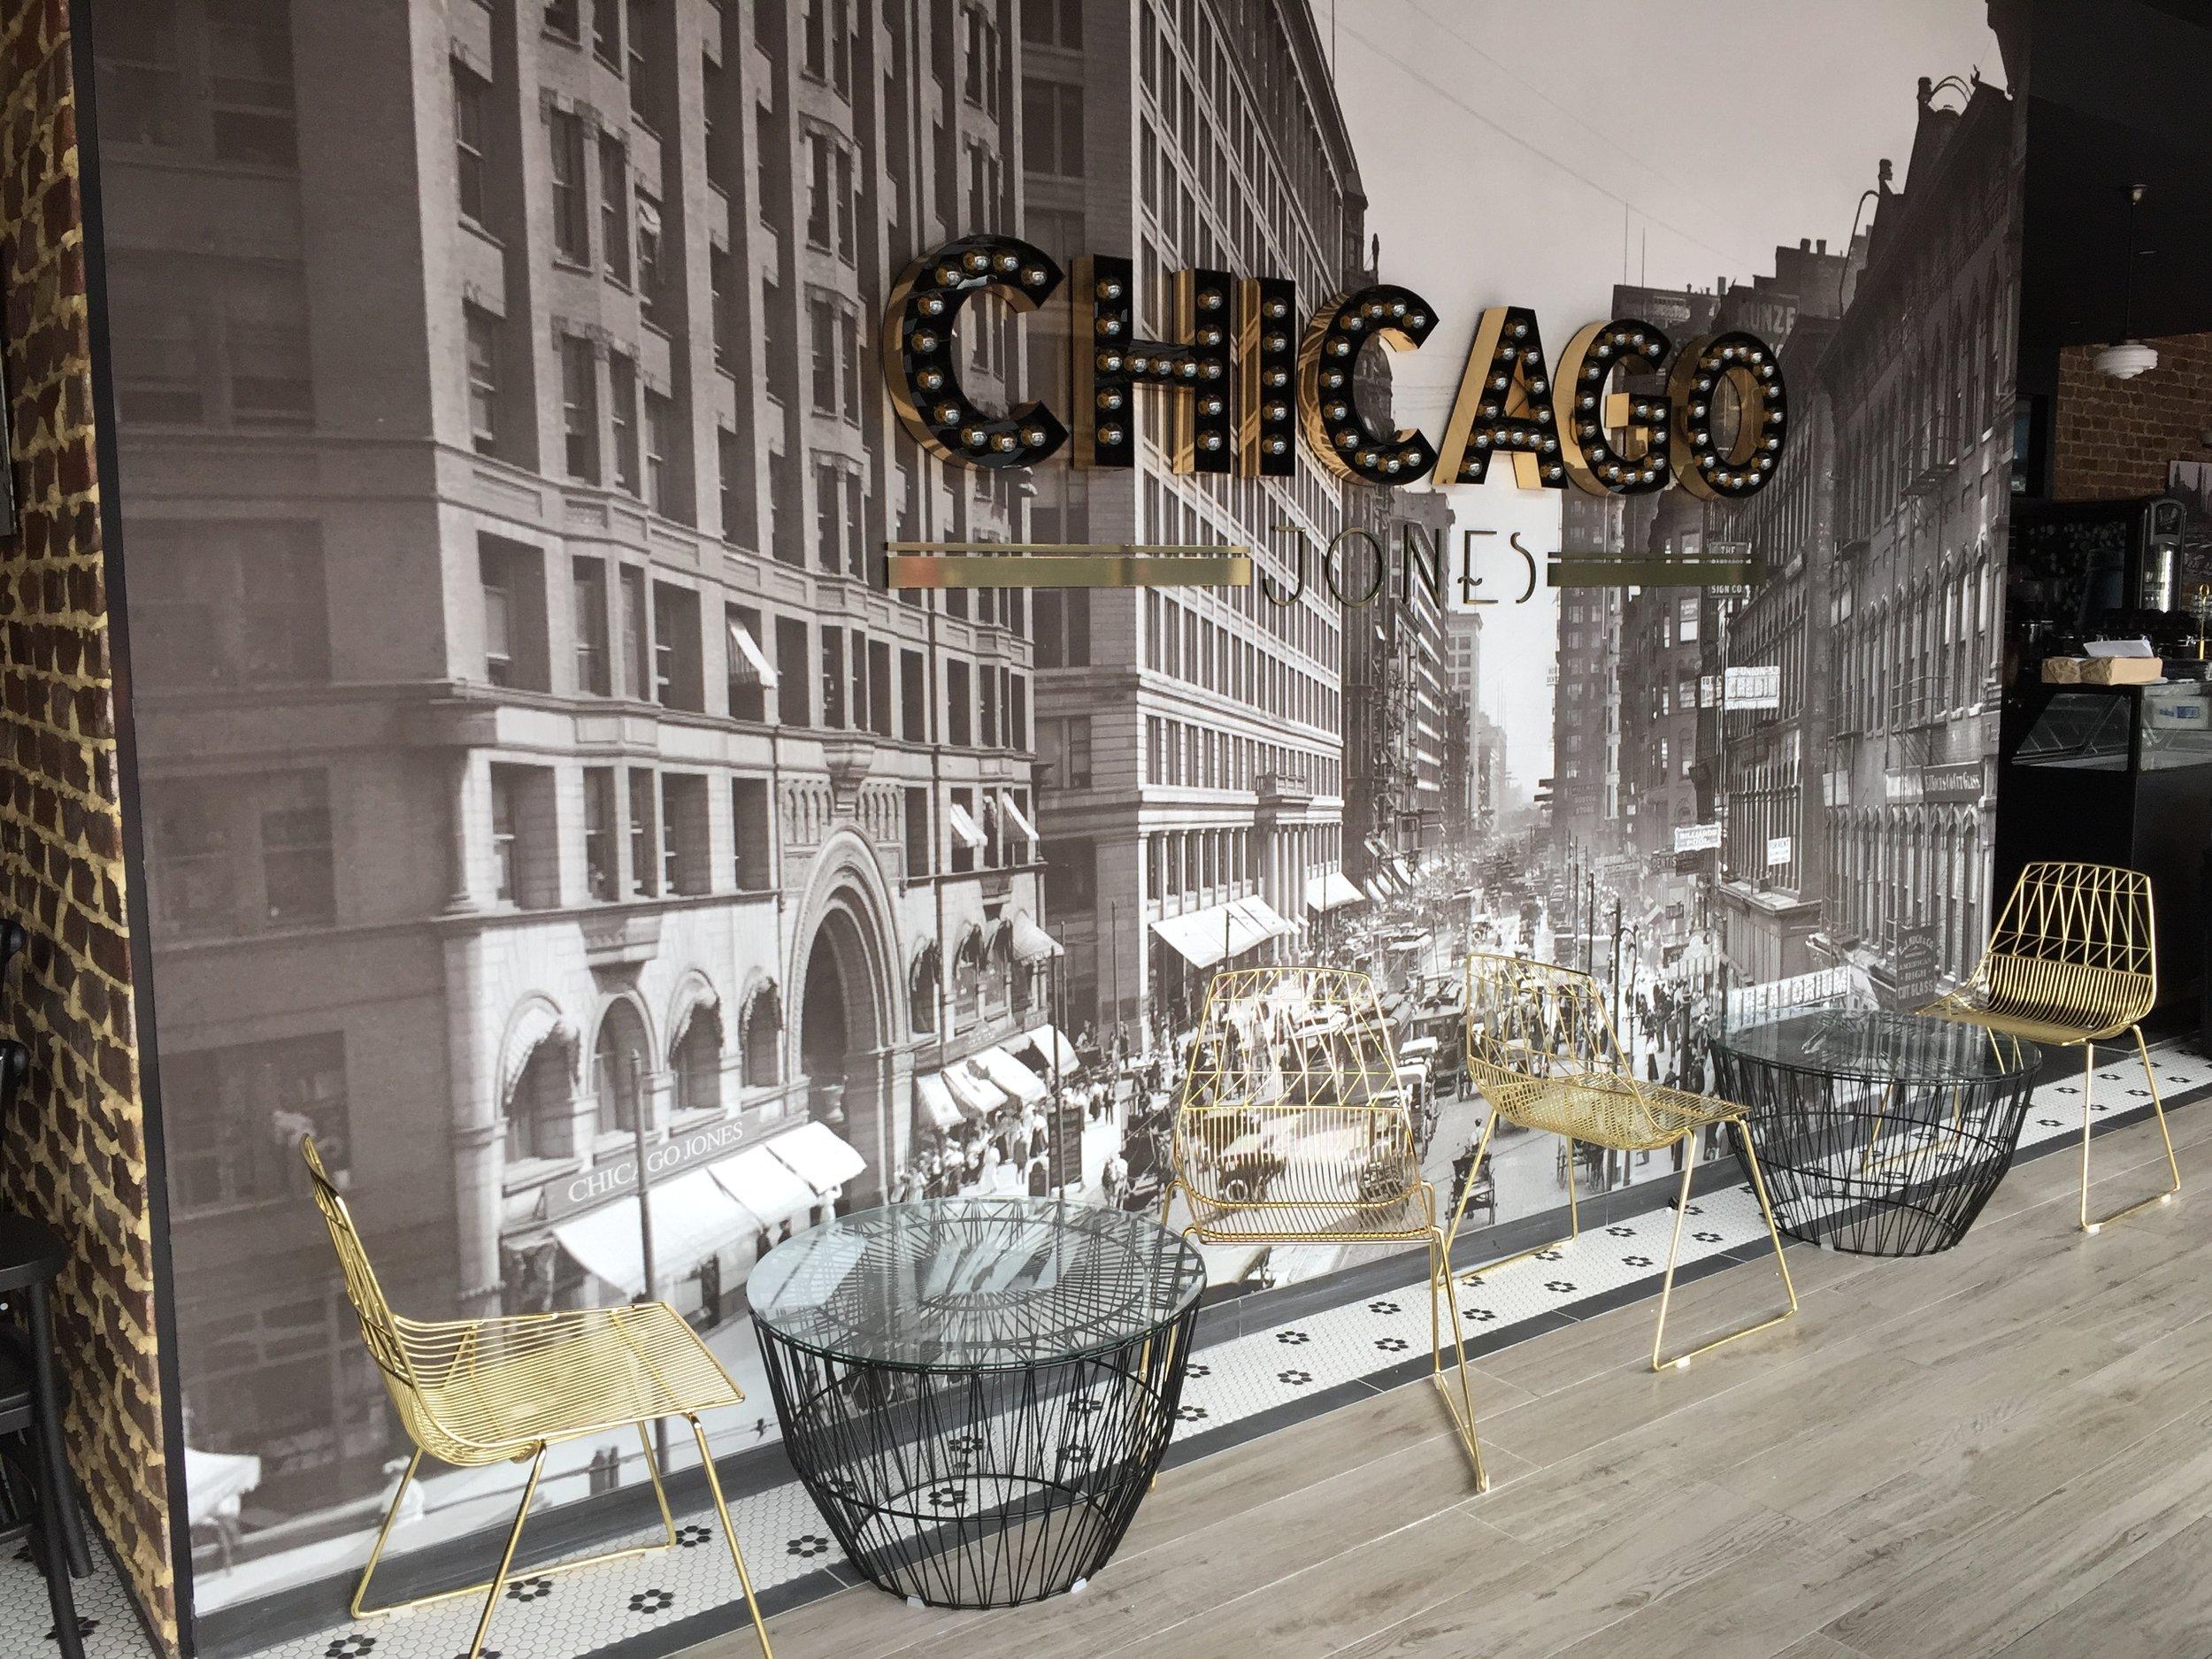 CHICAGOJONES -